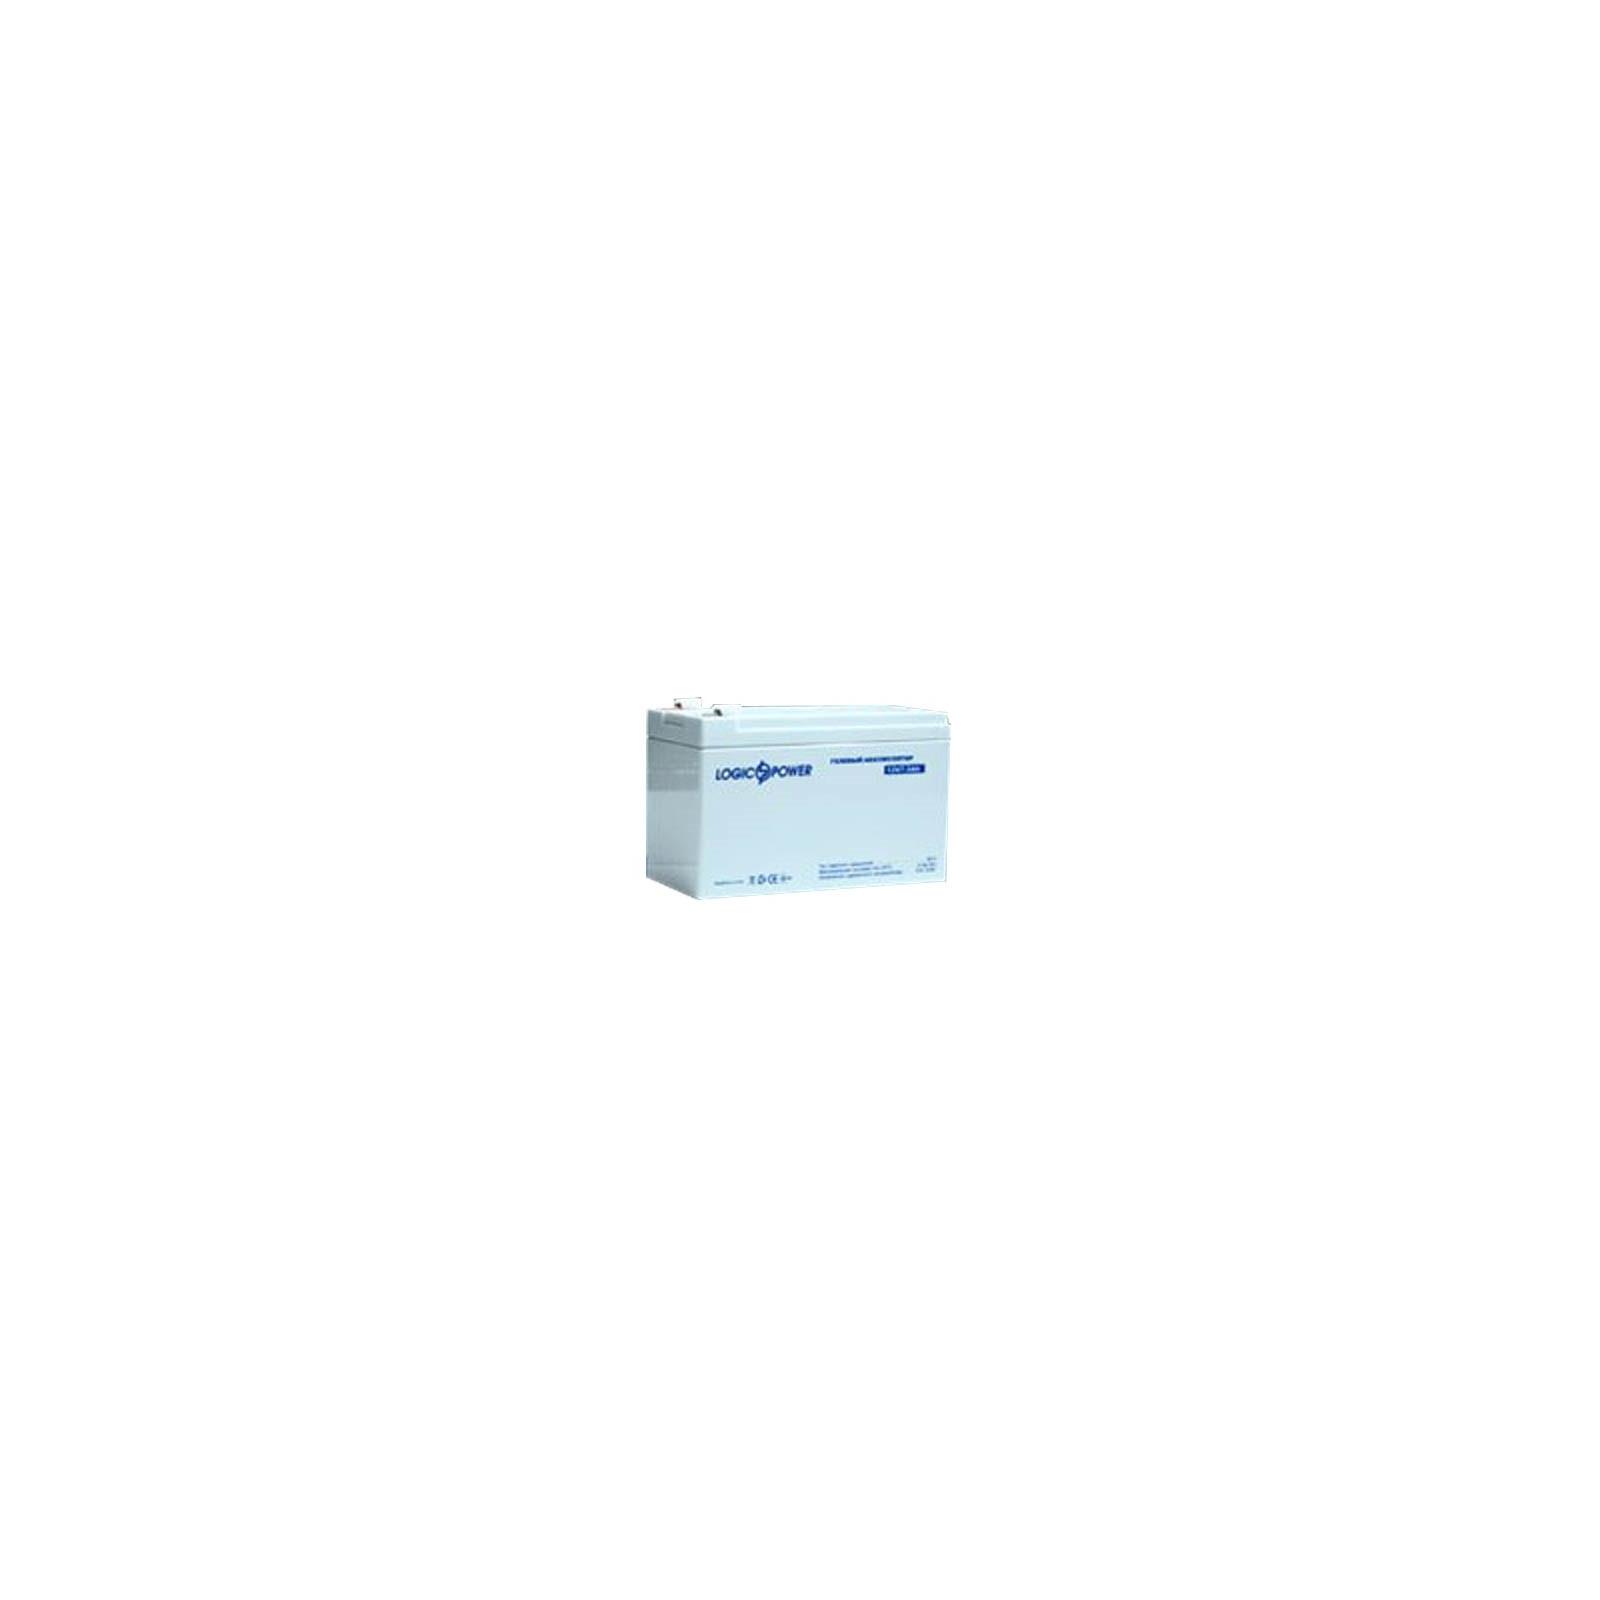 Батарея к ИБП LogicPower GL 12В 7.2 Ач (2333)